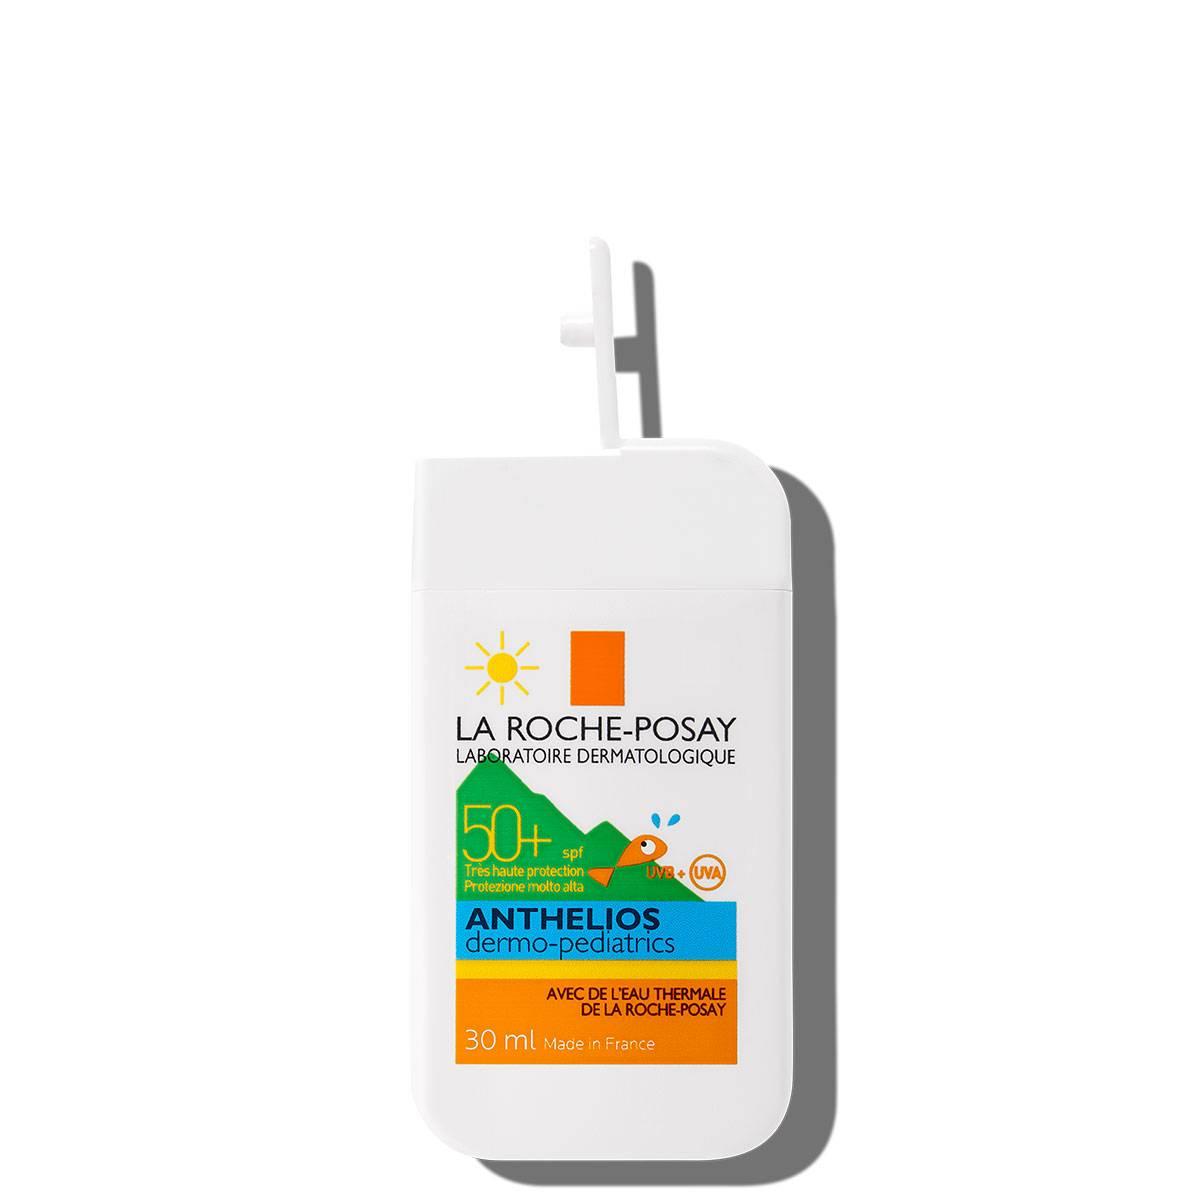 La Roche Posay ProductPage Sun Anthelios Pocket Dermo Pediatrics Lotio